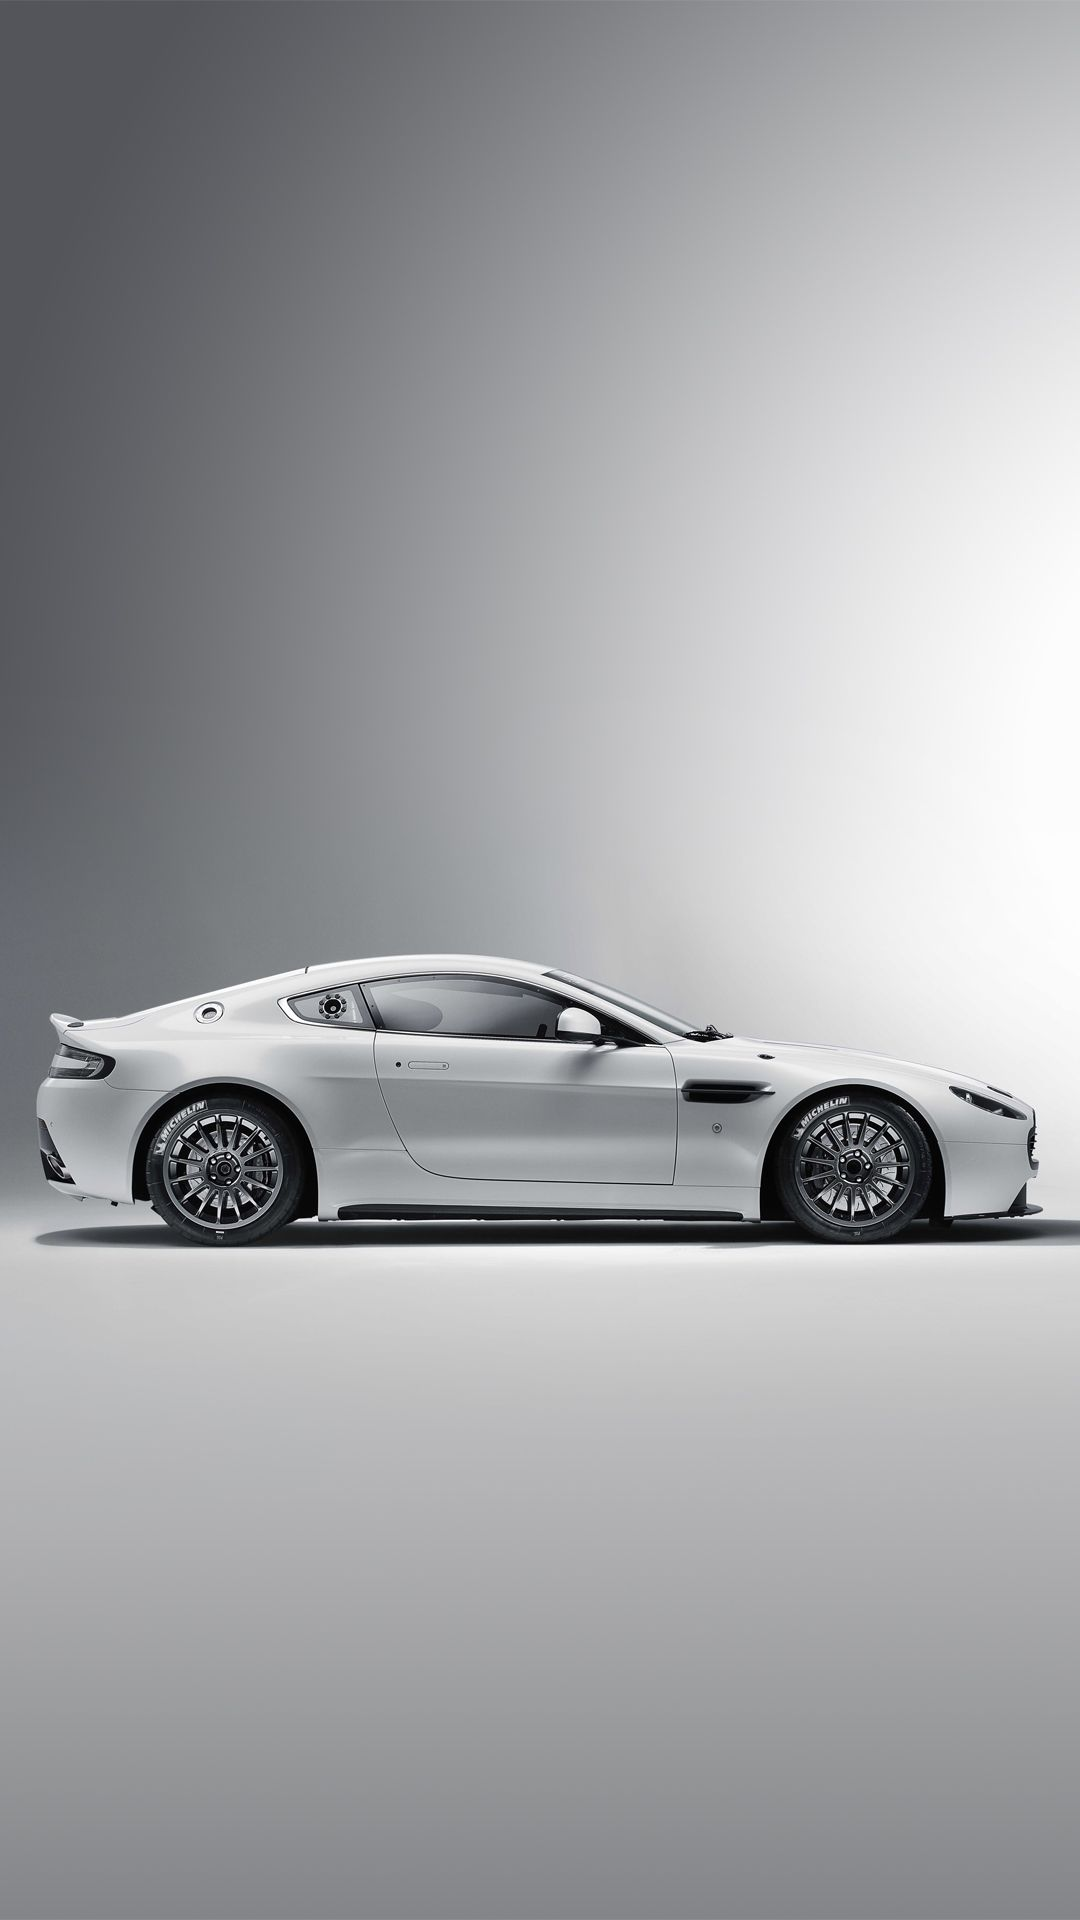 Cars Aston Martin Vantage Gt41 Android Wallpaper Wallpapers Hd 4k Background For Android Android Wallpaper Aston Martin Vantage 4k Background